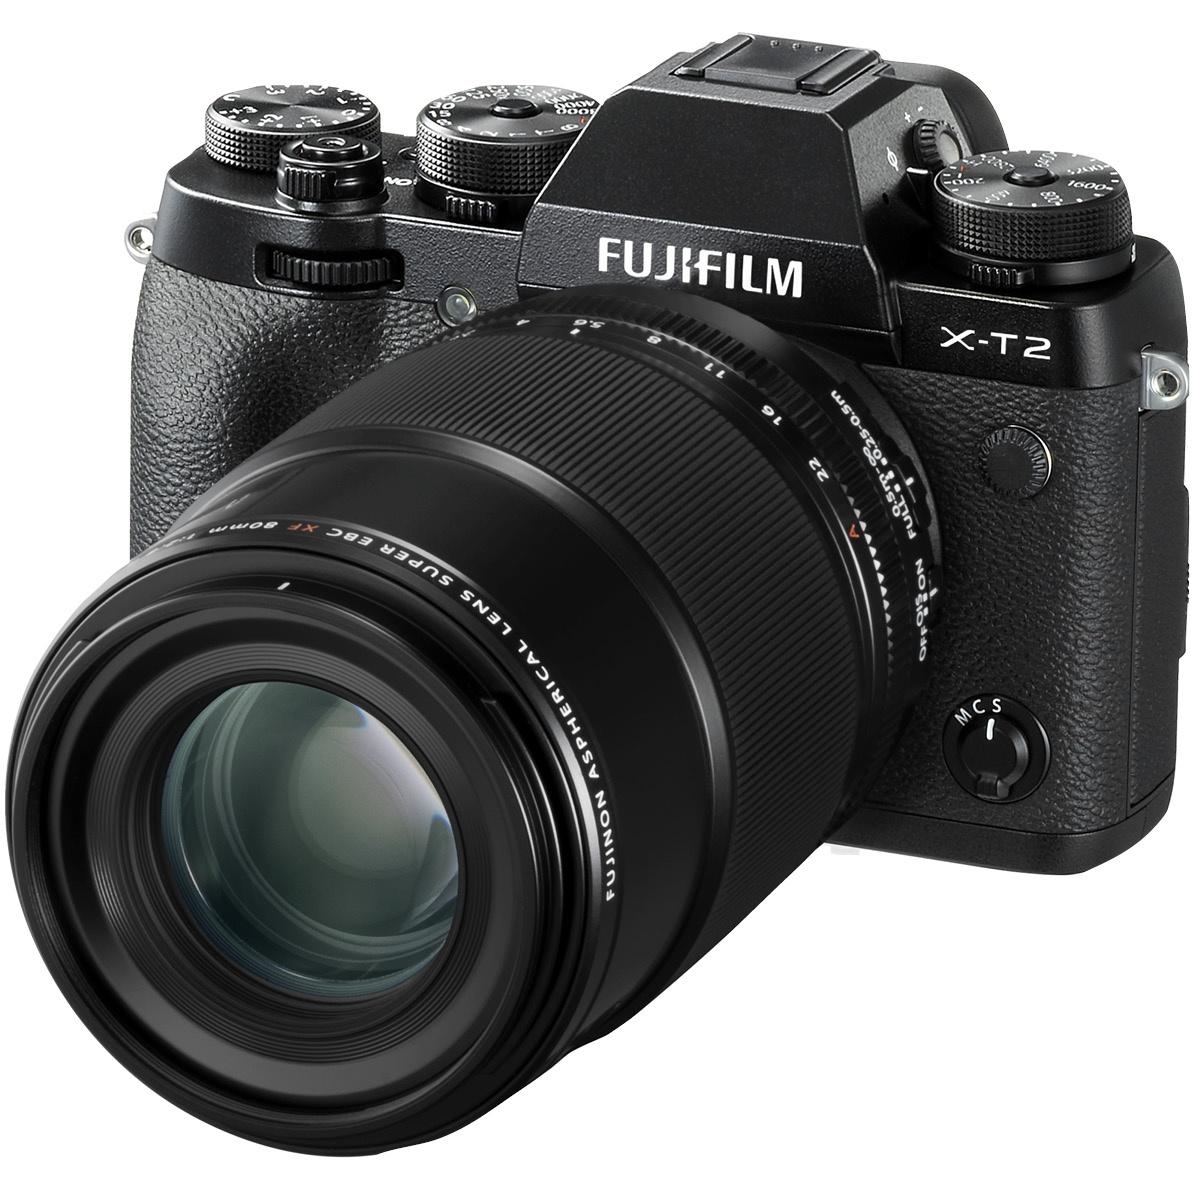 Fujifilm XF 80mm 1:2,8 LM WR Macro